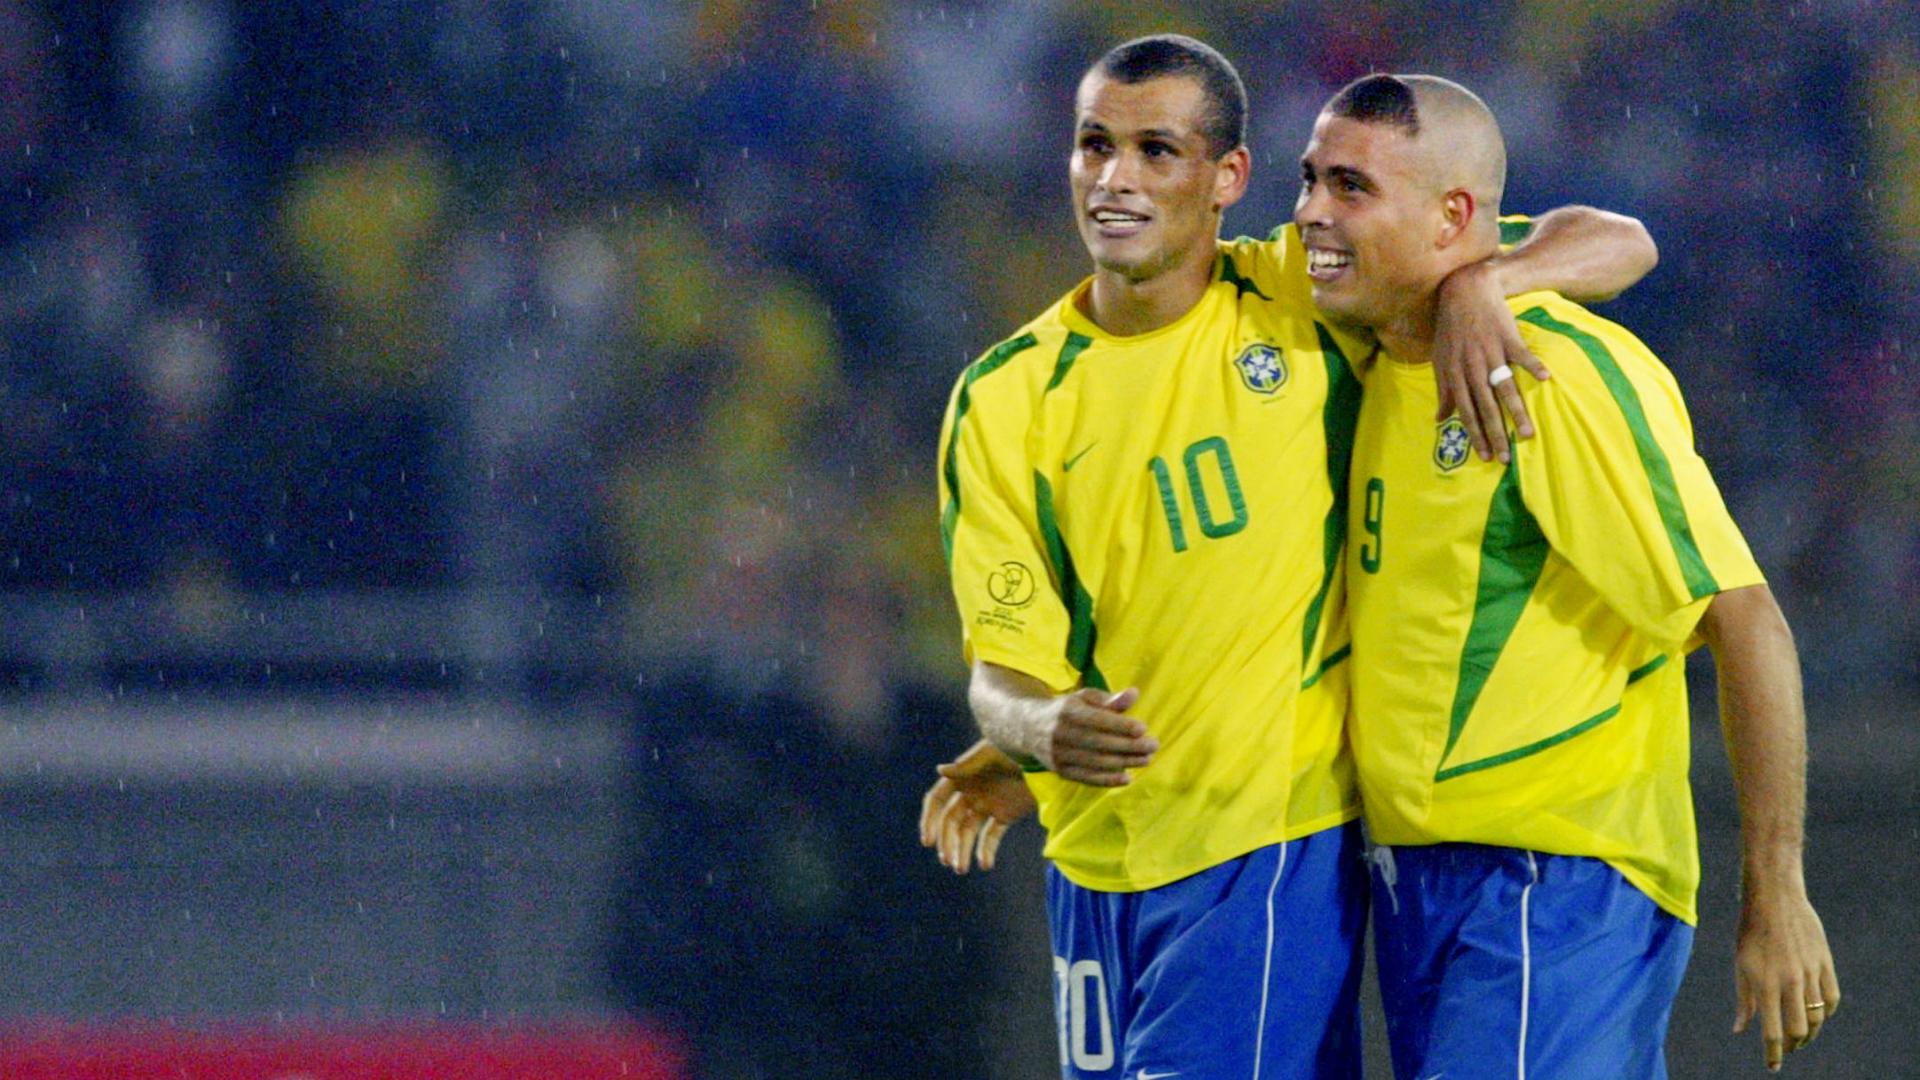 Ronaldo, Rivaldo